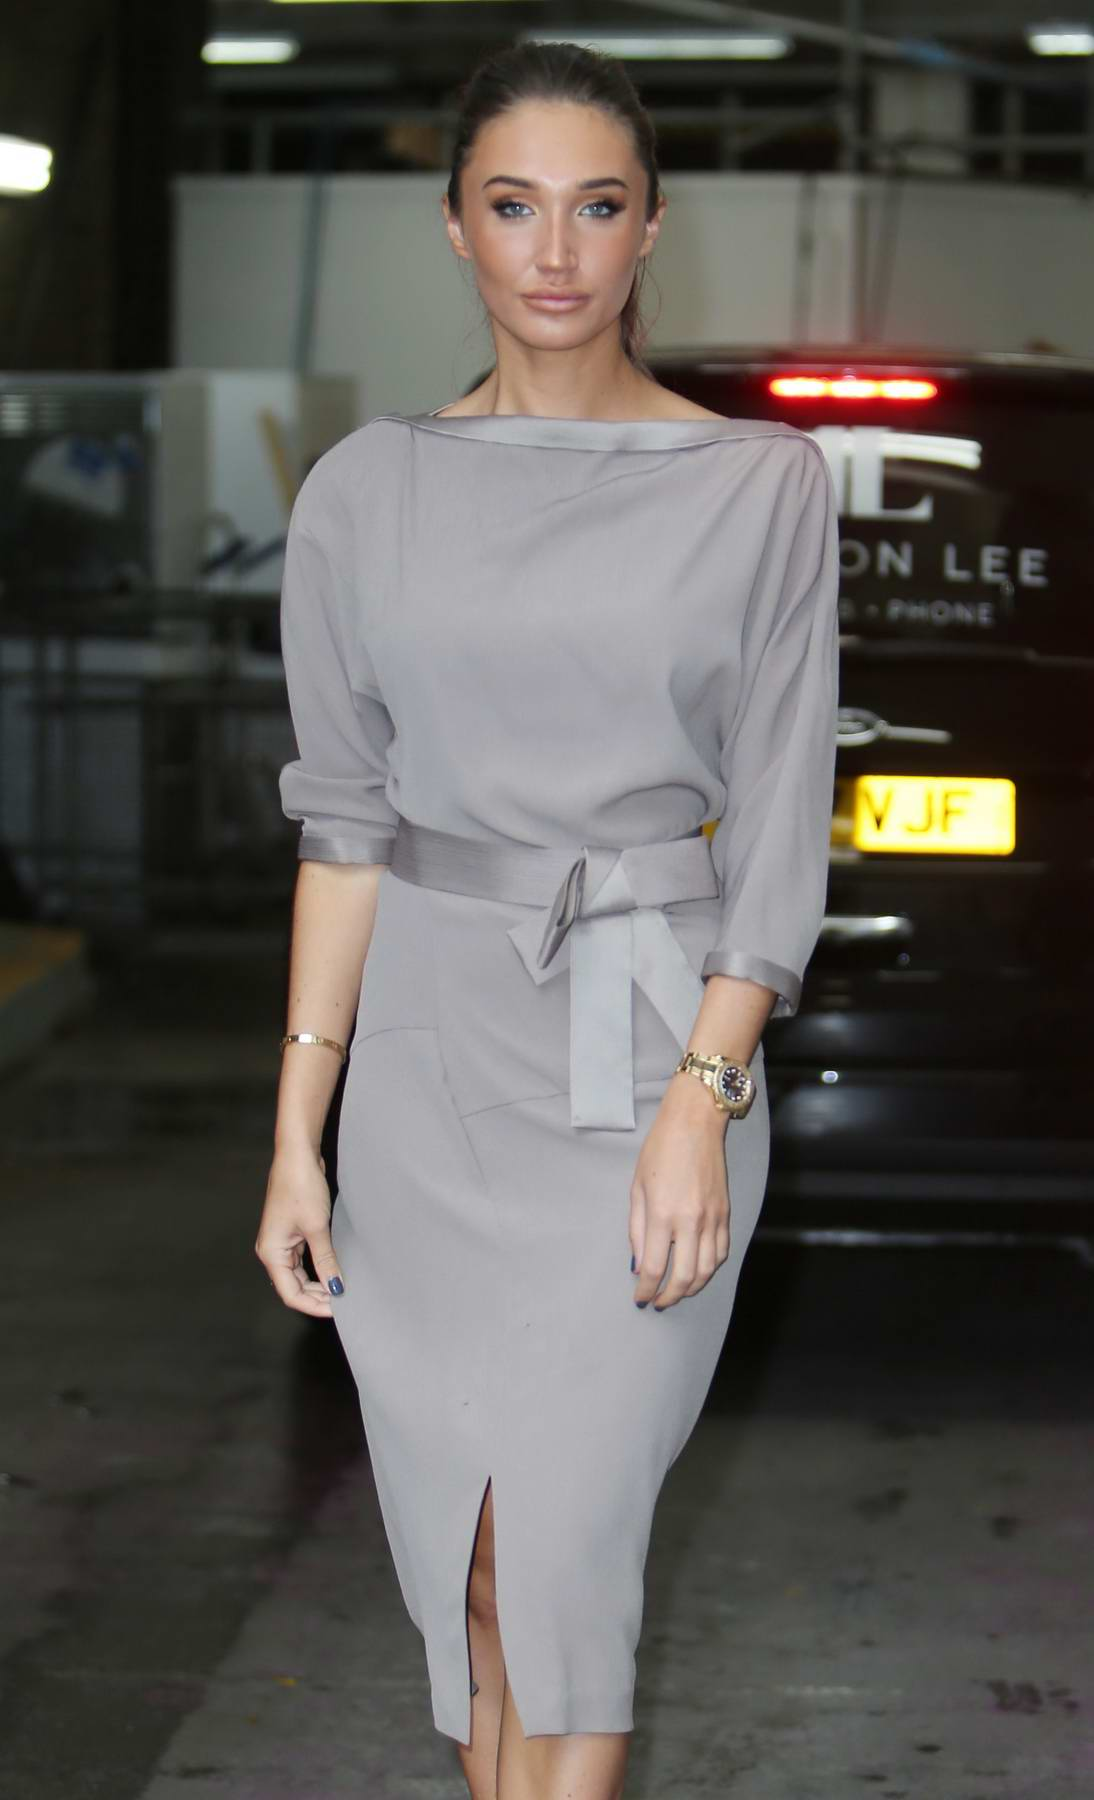 Megan McKenna spotted outside ITV Studios in London